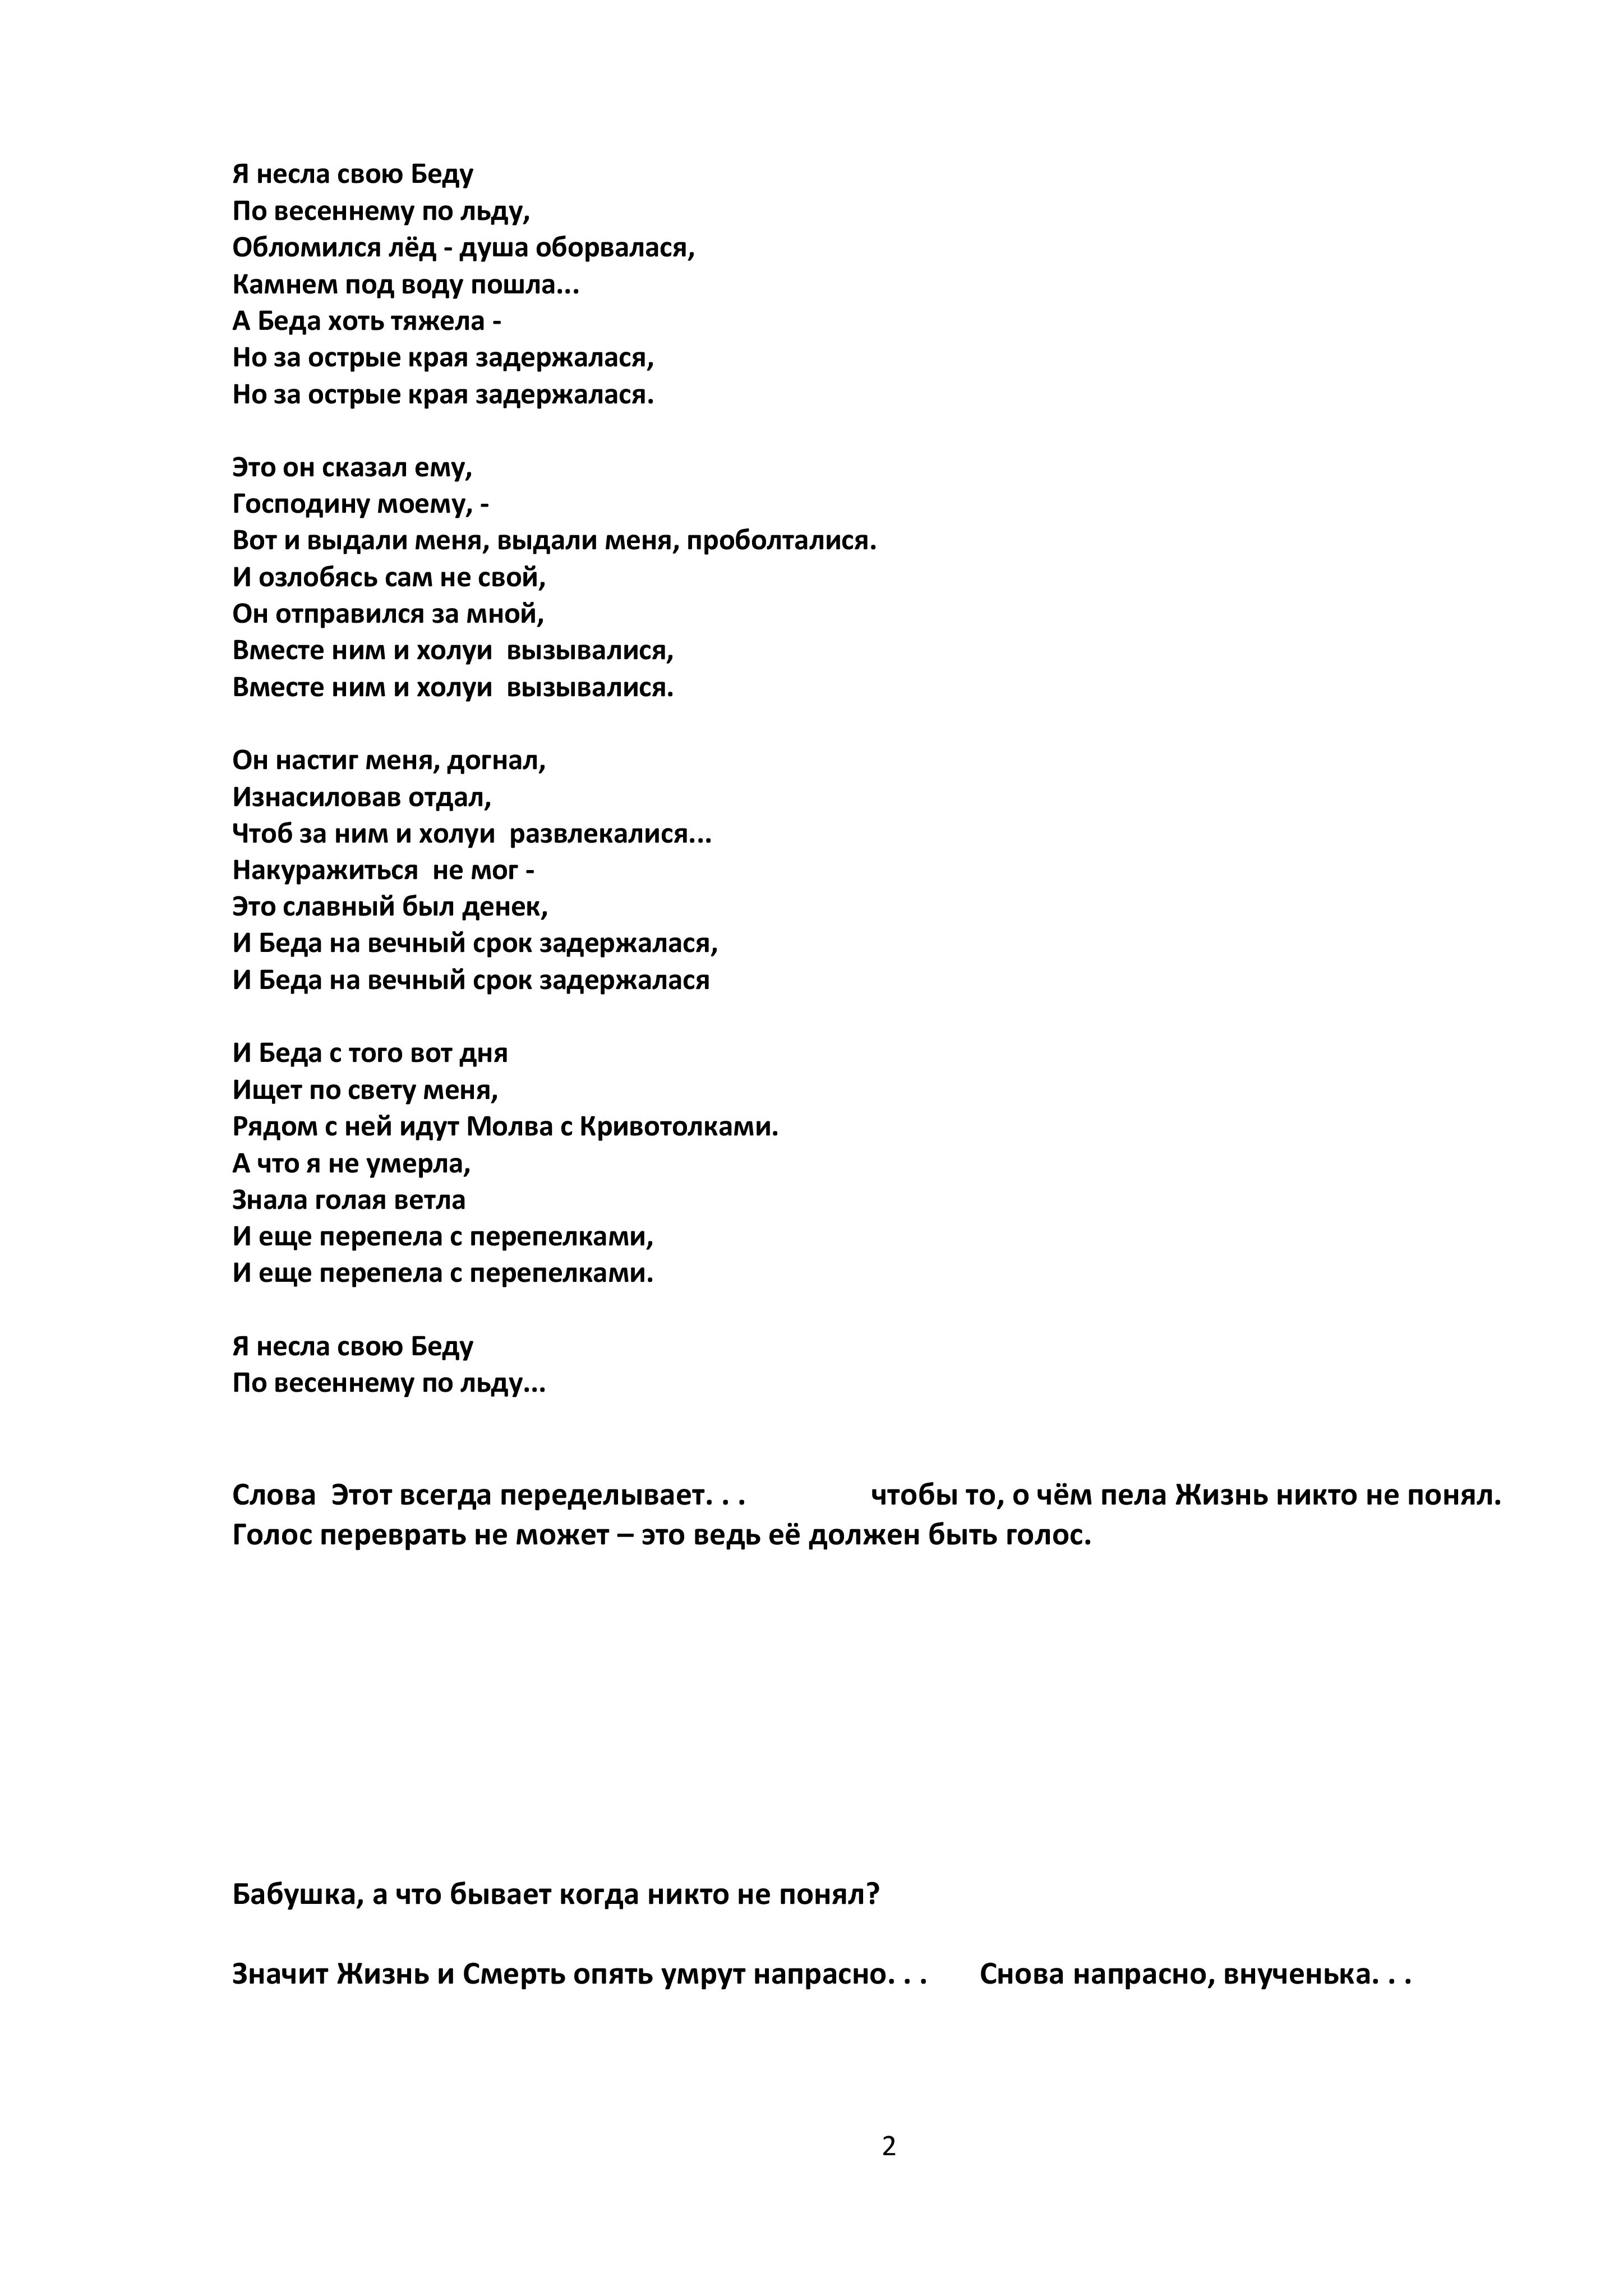 Голос-002